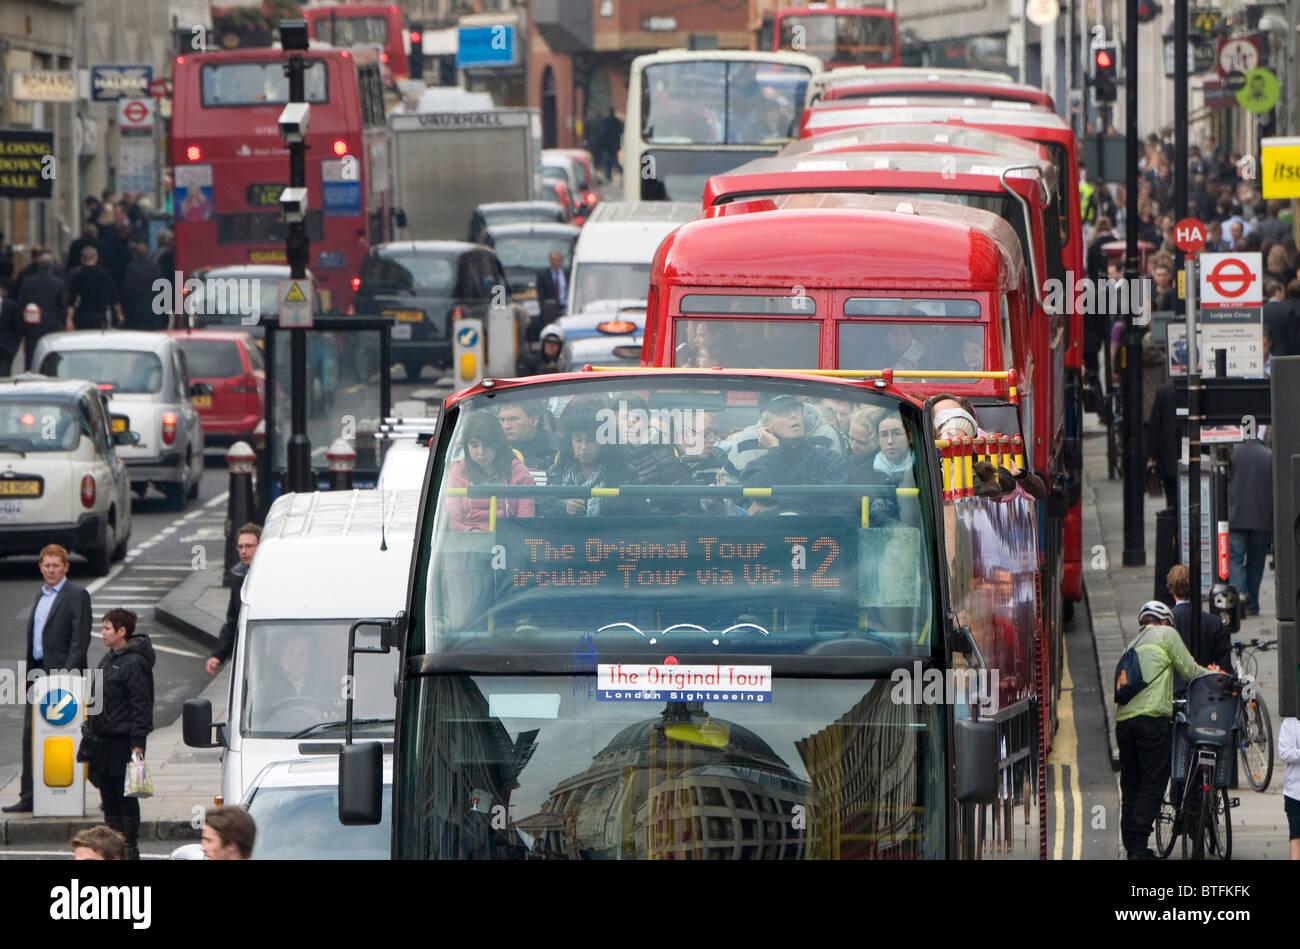 heavy traffic congestion, london, england - Stock Image